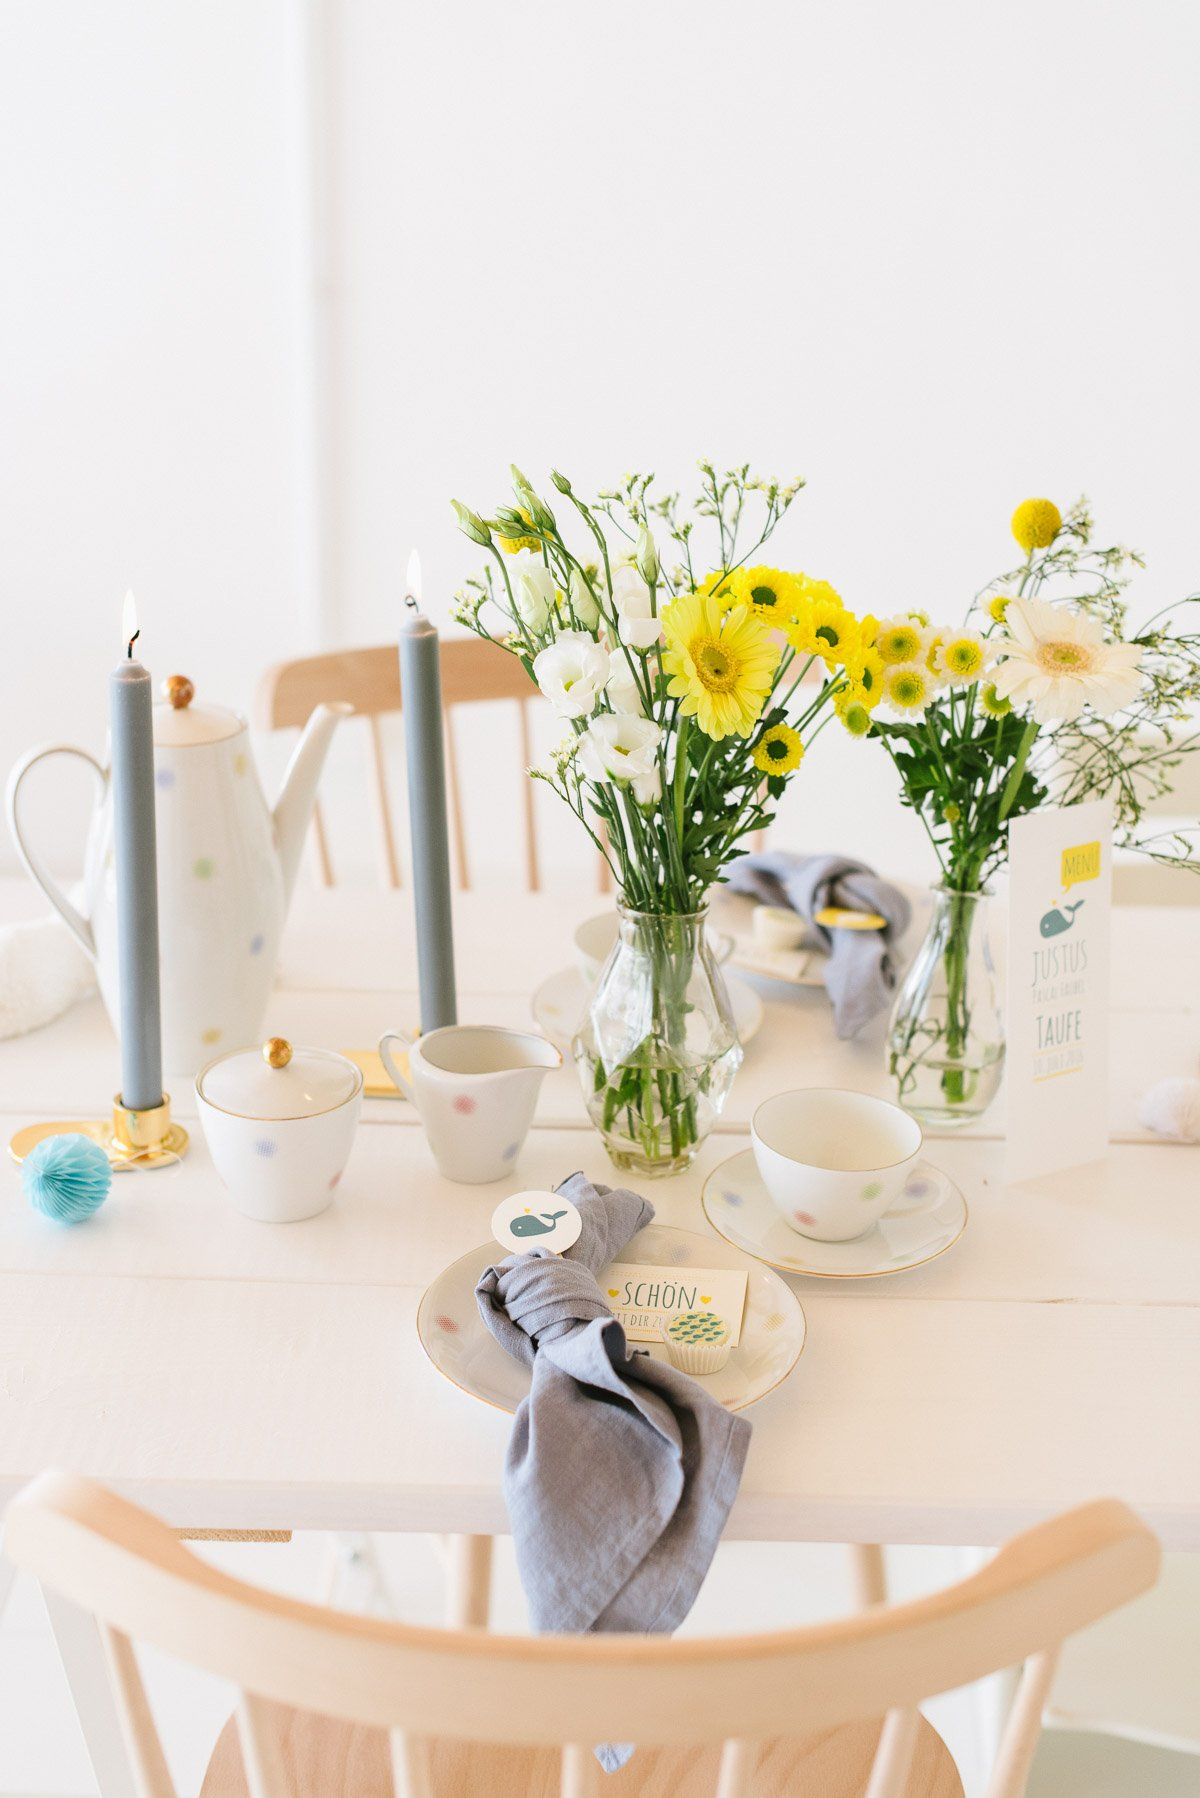 blumen taufe tischdeko stk filzblten grn streudeko tischdeko filz blten blumen filzblumen. Black Bedroom Furniture Sets. Home Design Ideas